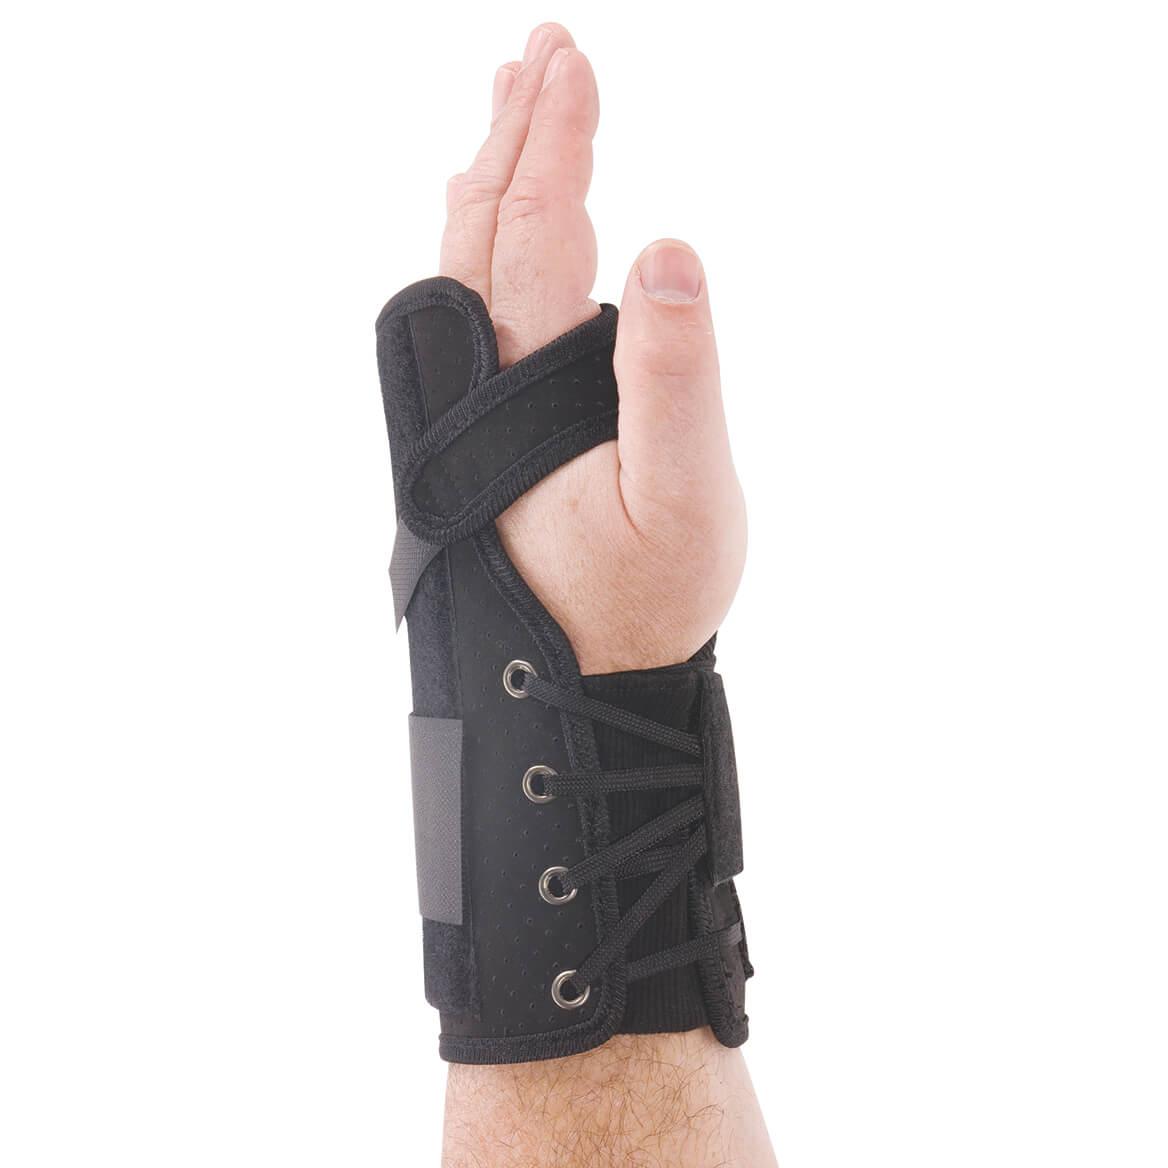 Orthopedic Hand/Wrist Support-369910